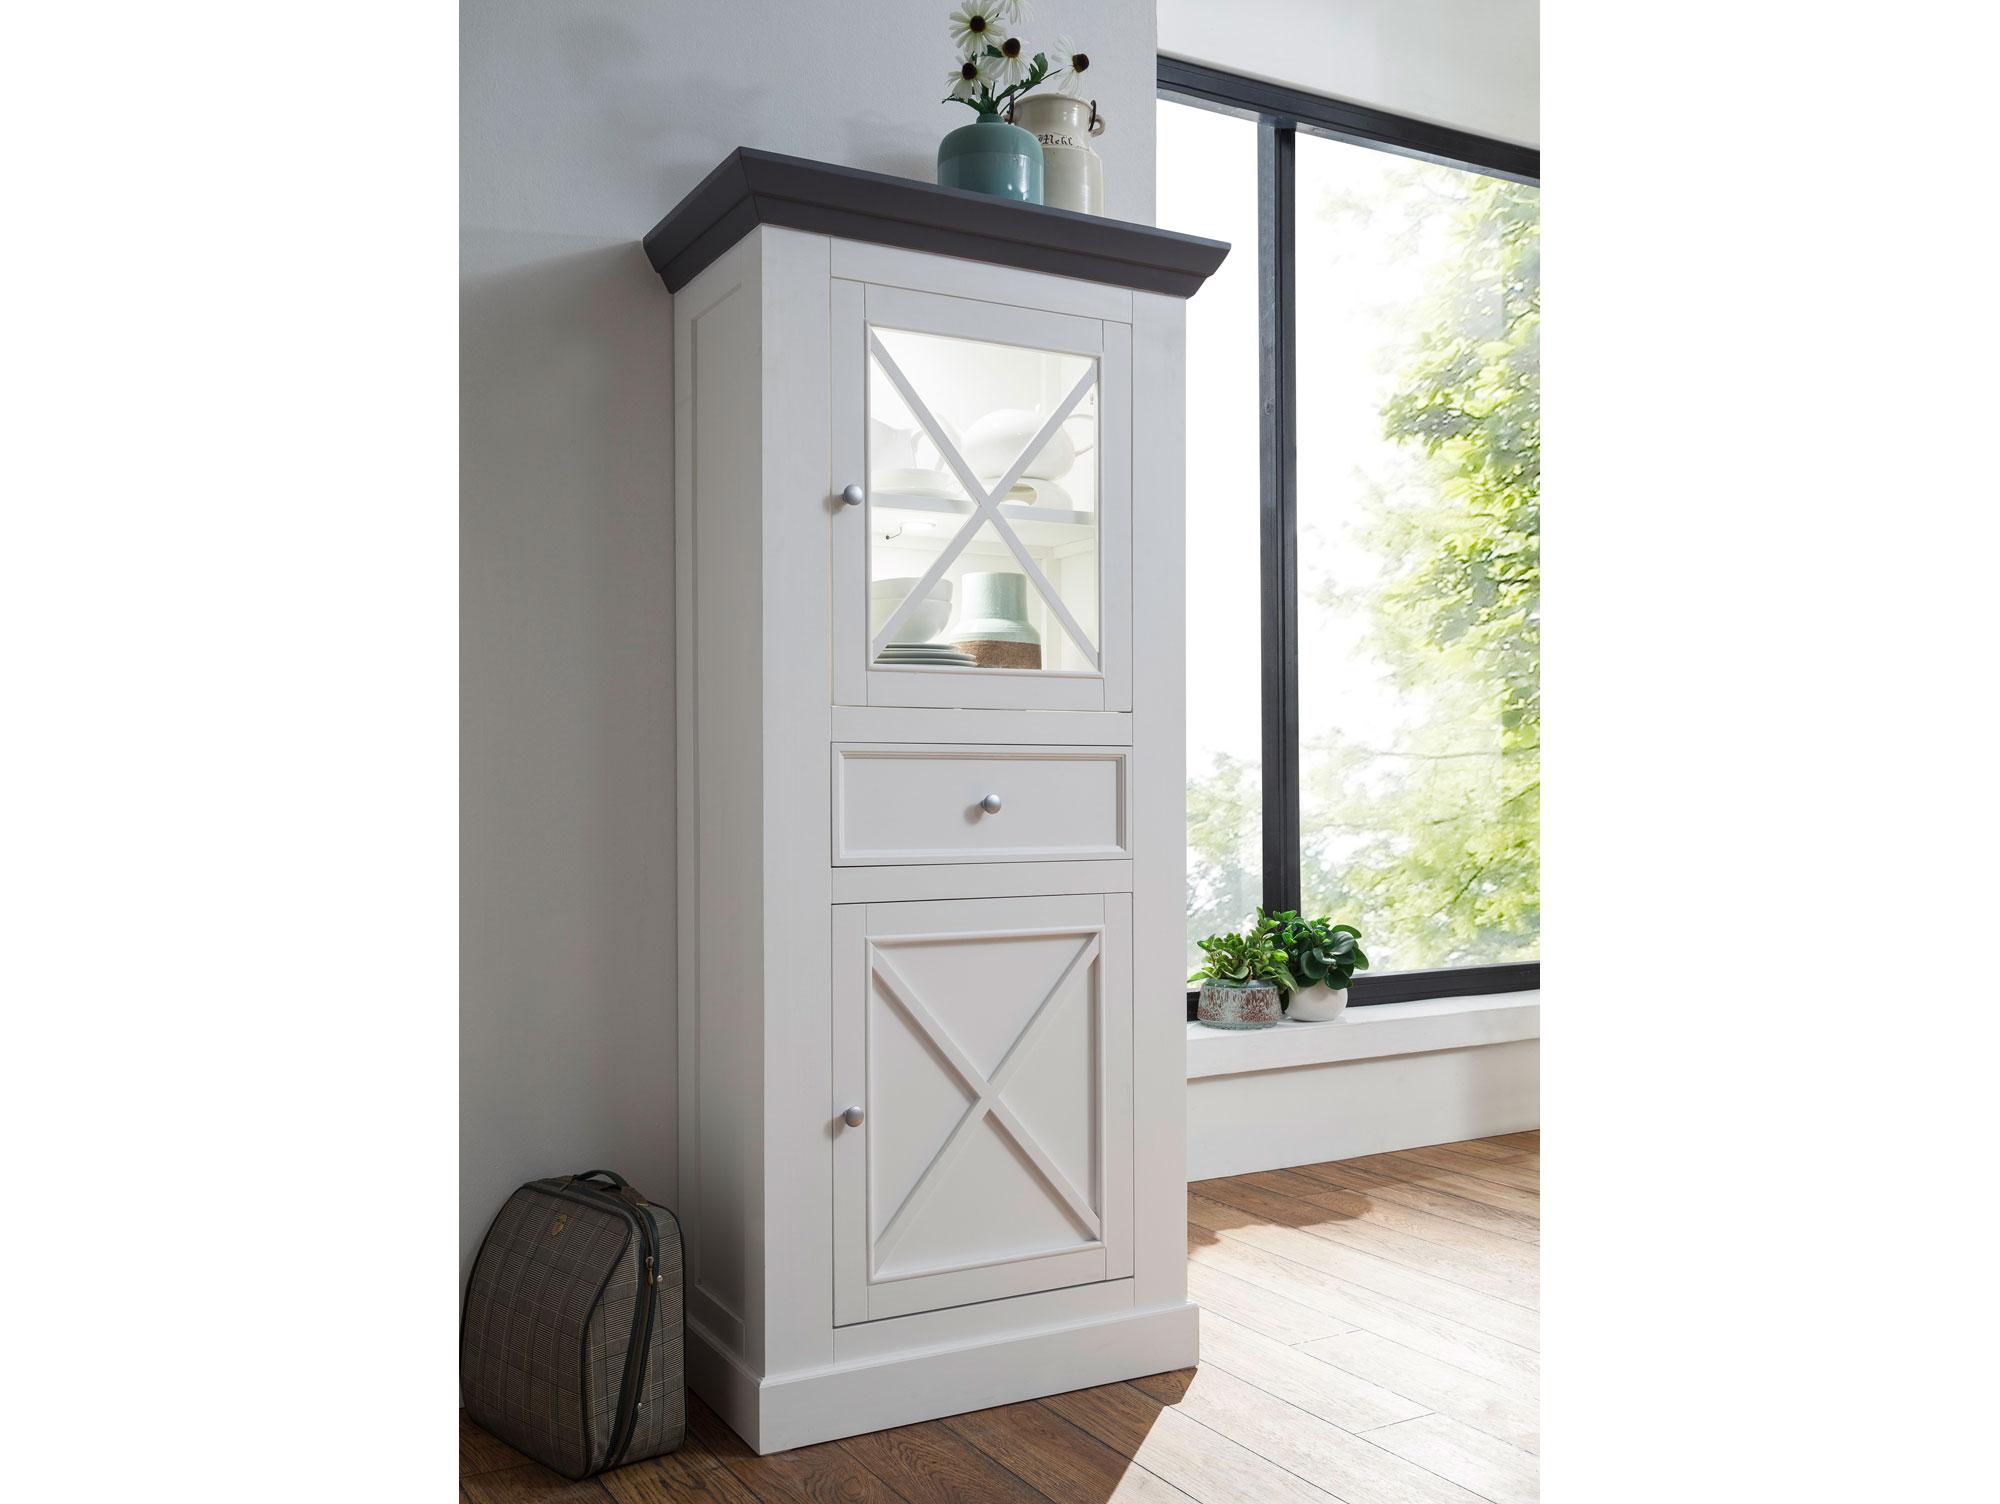 graz wohnwand weiss lackiert. Black Bedroom Furniture Sets. Home Design Ideas